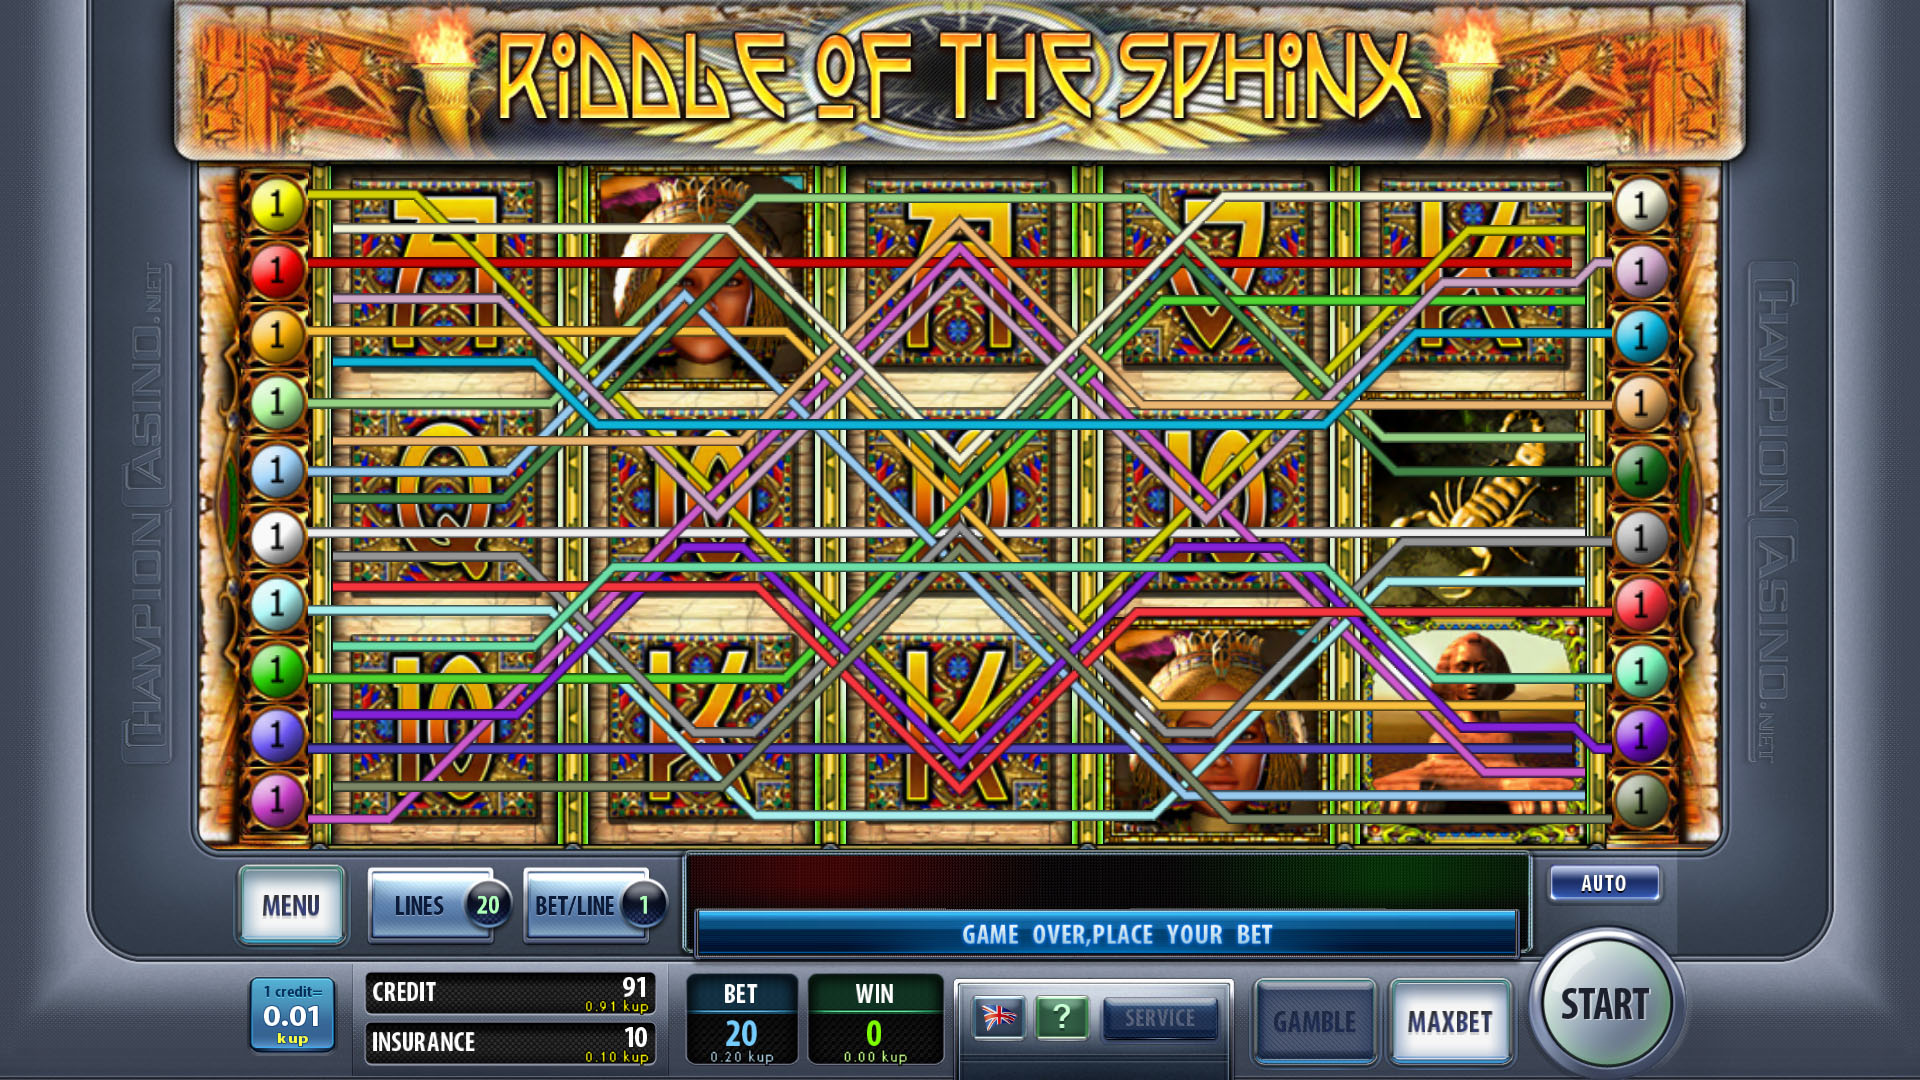 Игровые автоматы sphinx ii играть на фишки игровые автоматы дешки